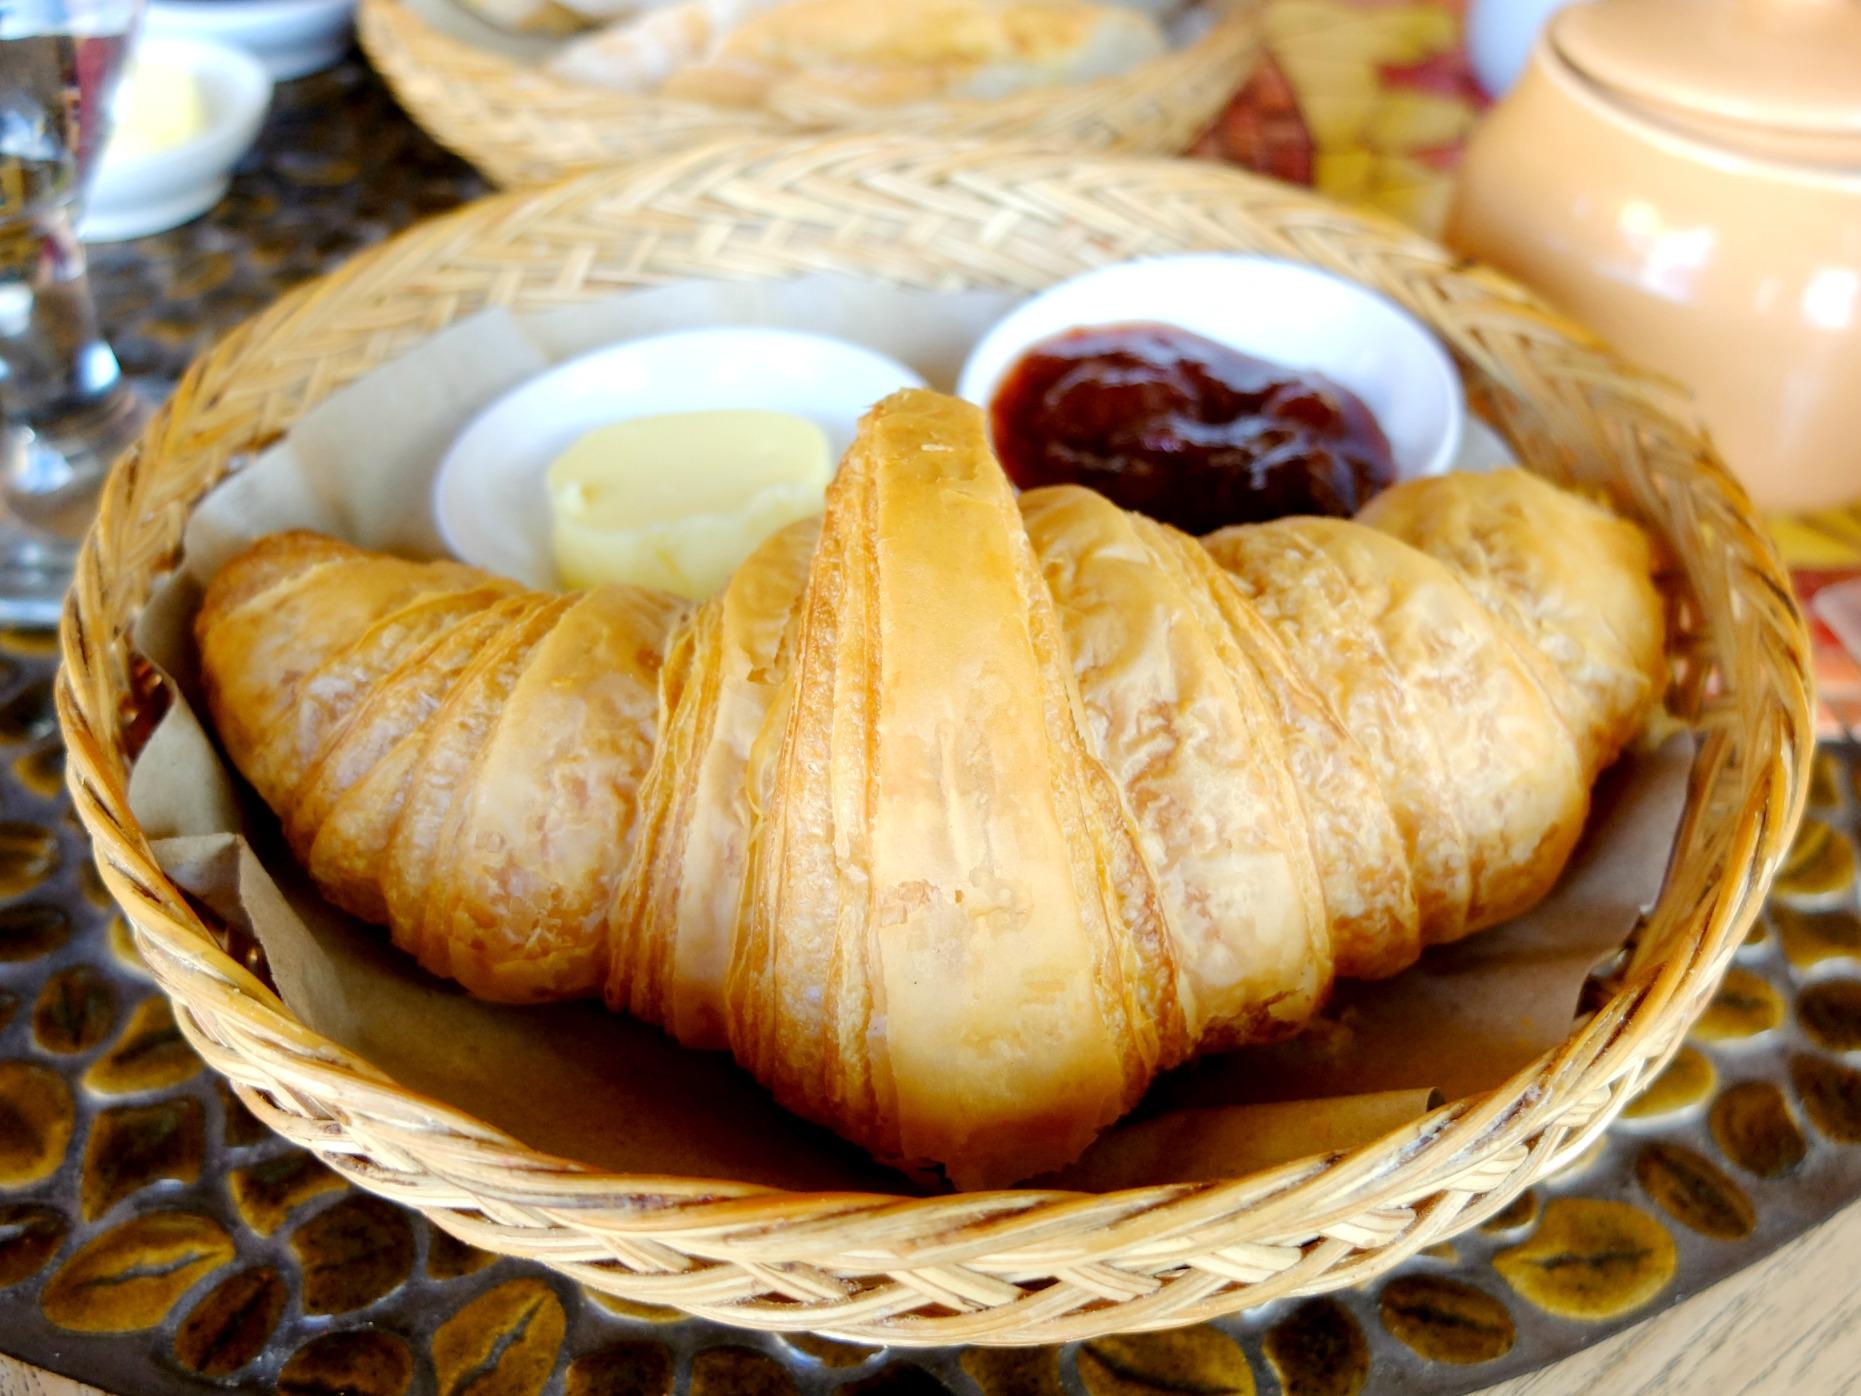 Cafe Moka Croissant